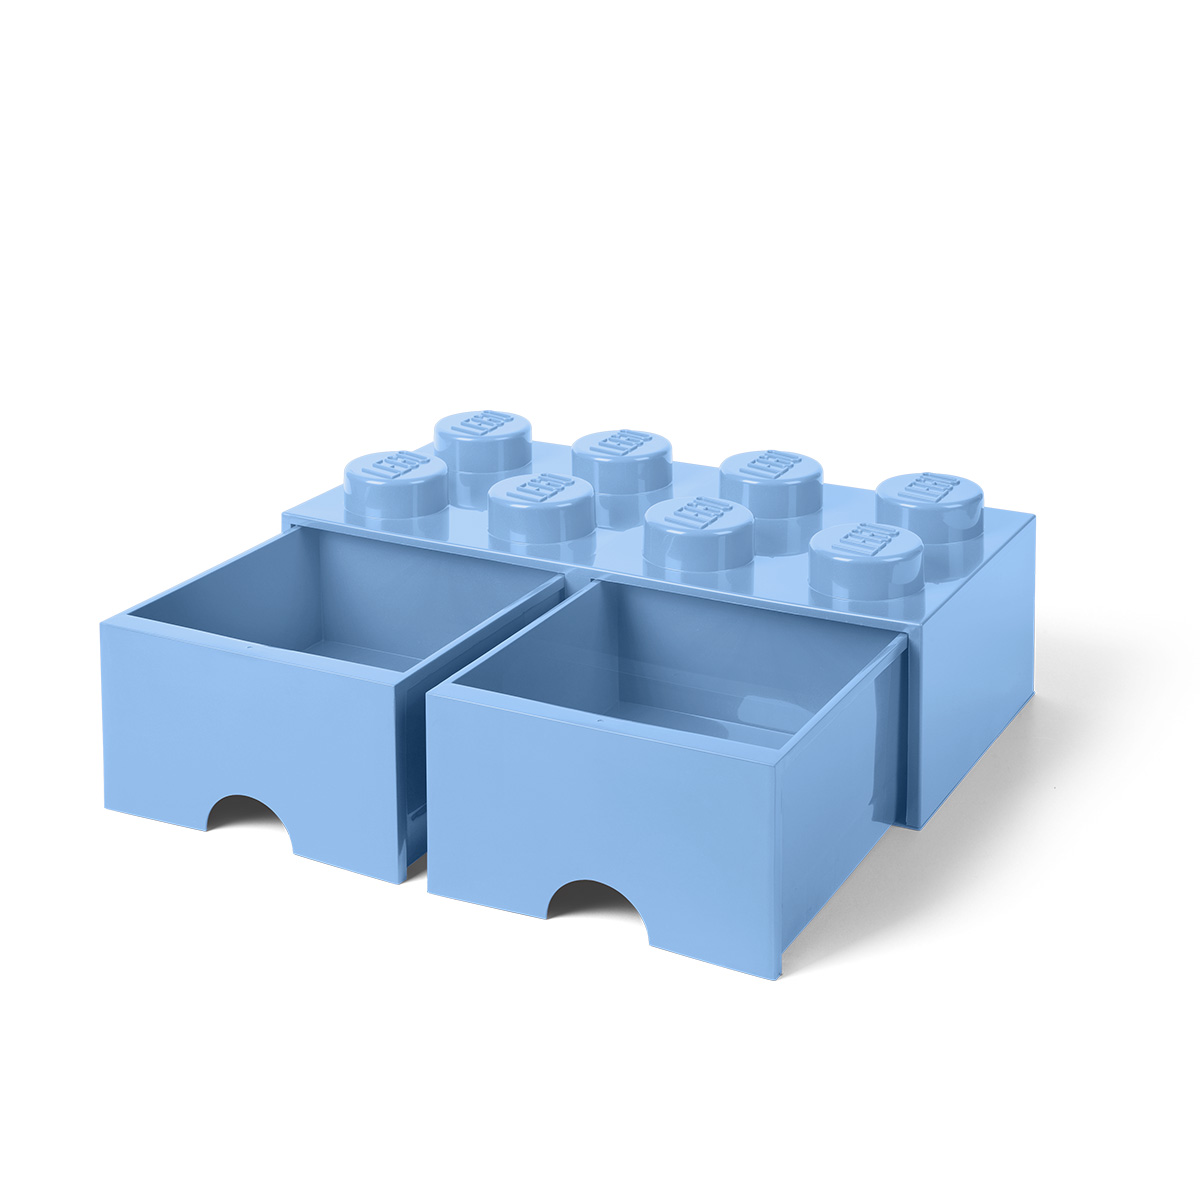 LEGO opbevaringskasse med 2 skuffer - Lyseblå